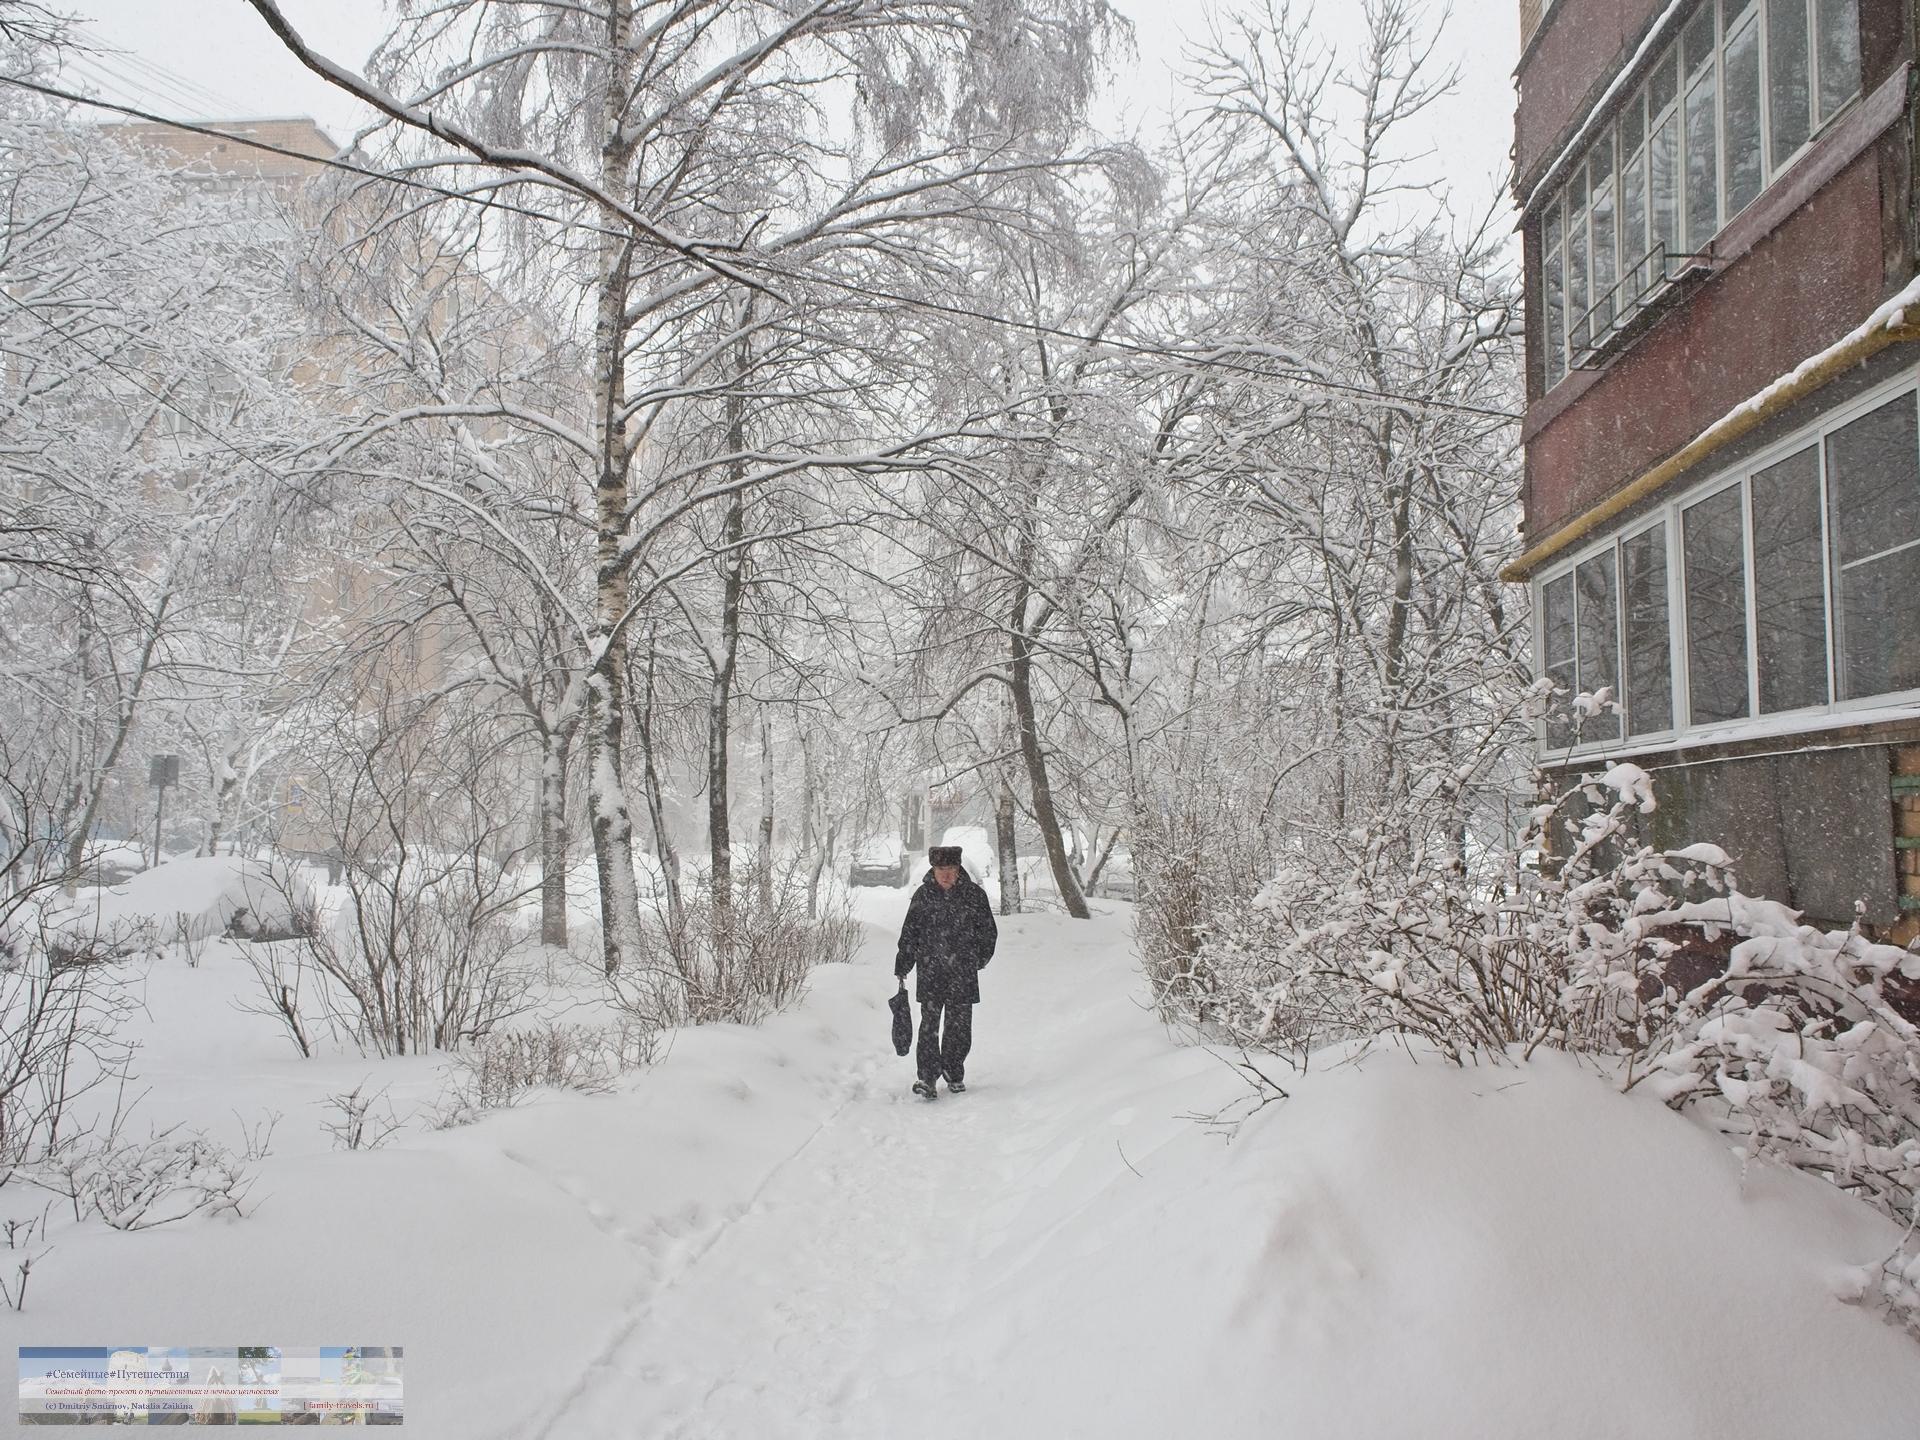 02042018-1422-Blog-020 Просто фото  Снегопад года